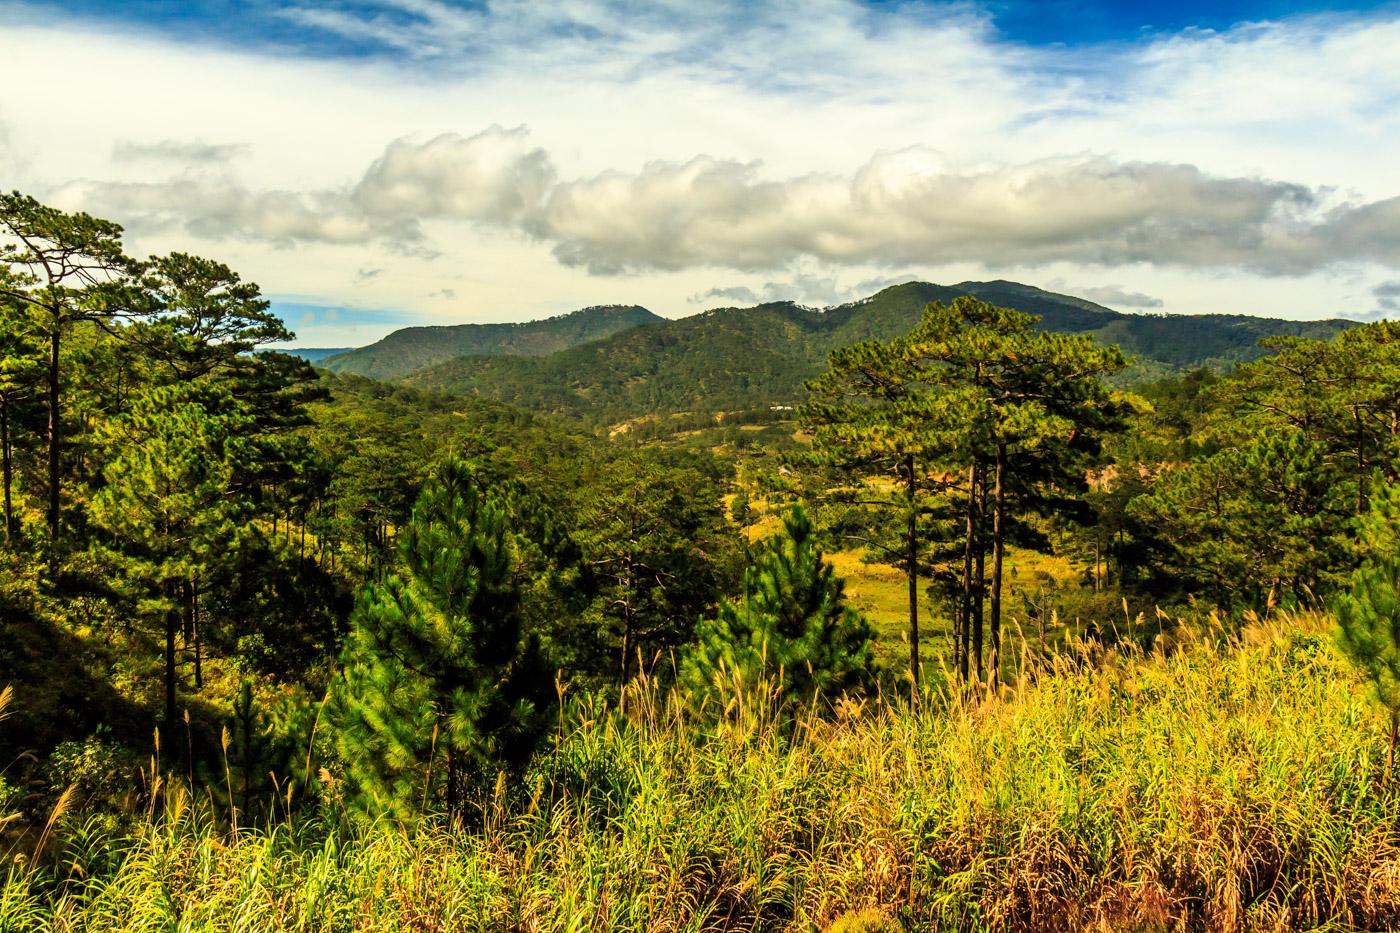 I said goodbye to the pine trees of Da Lat.